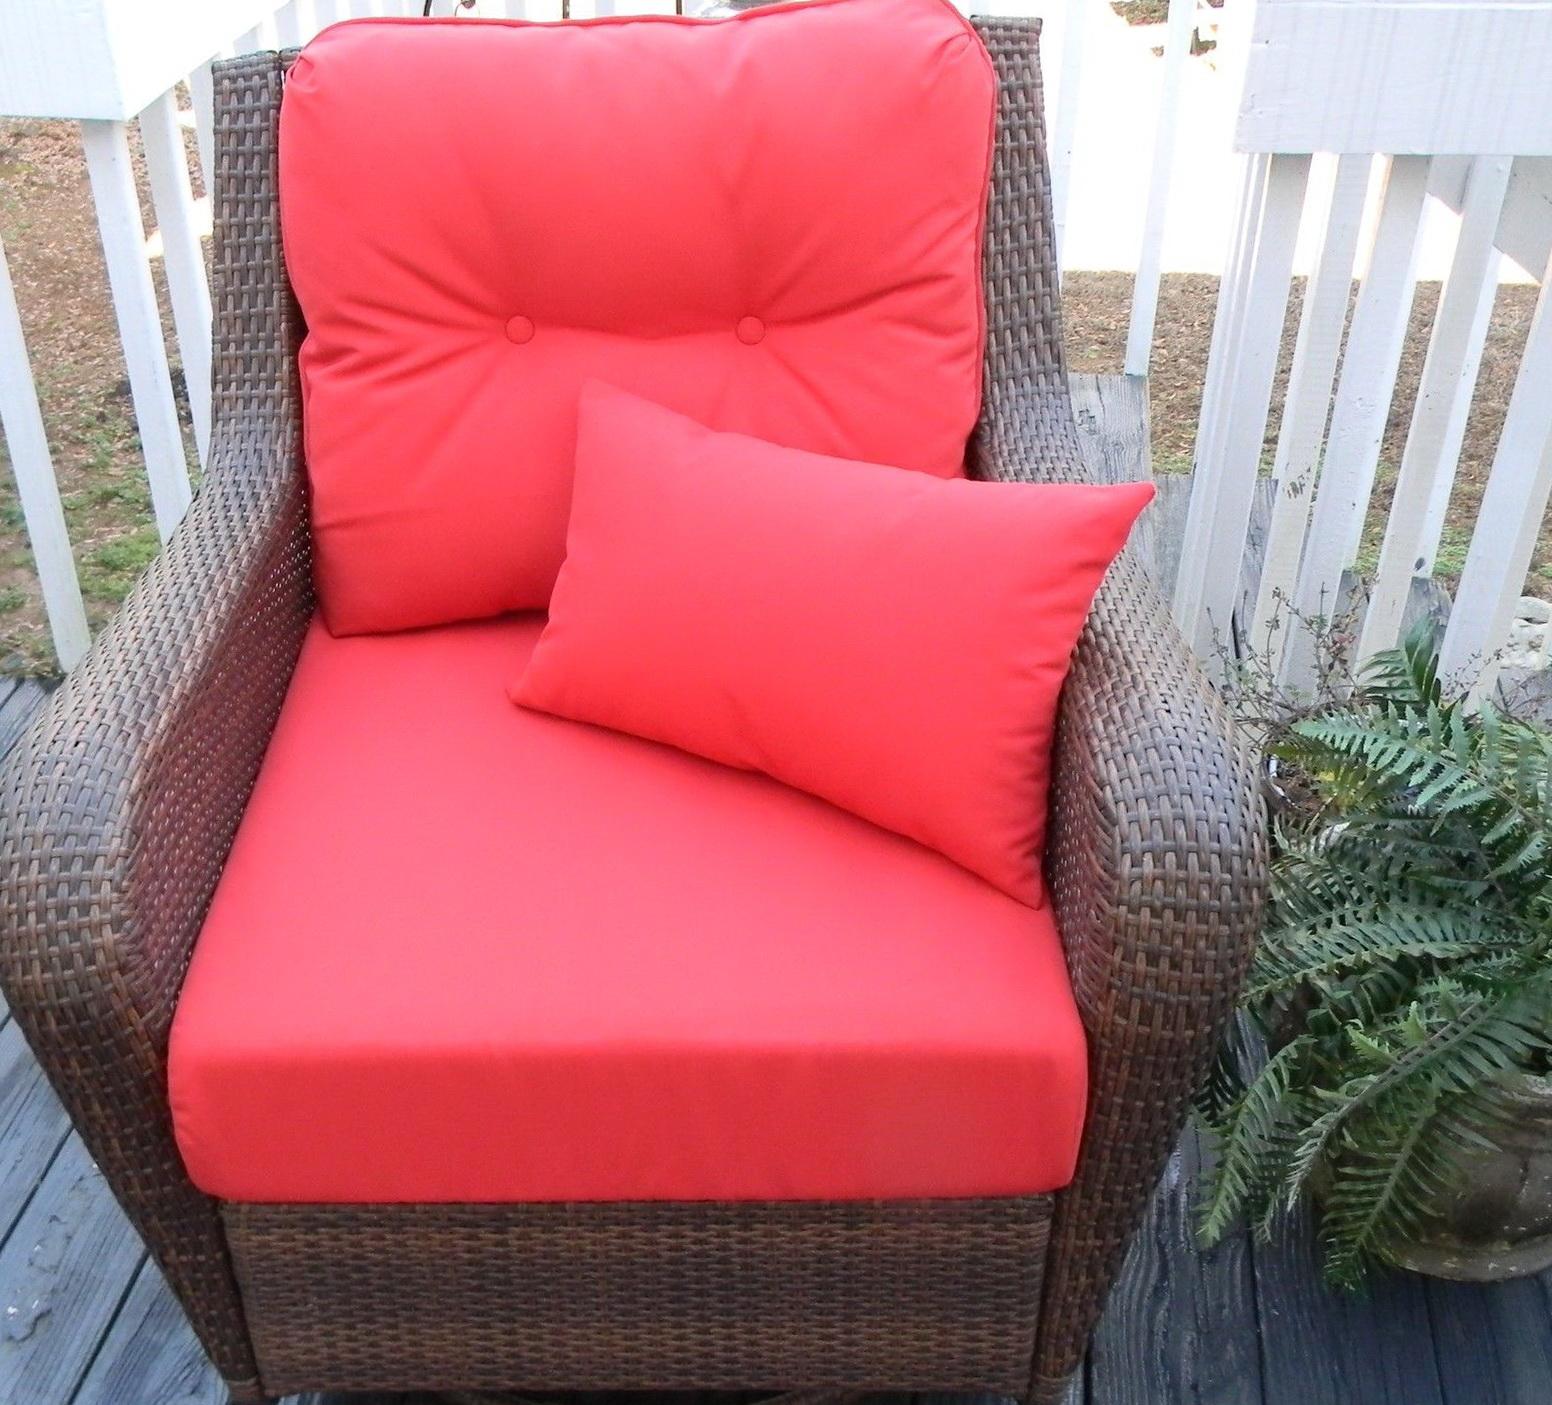 Outdoor Deep Seat Cushions Sale Home Design Ideas